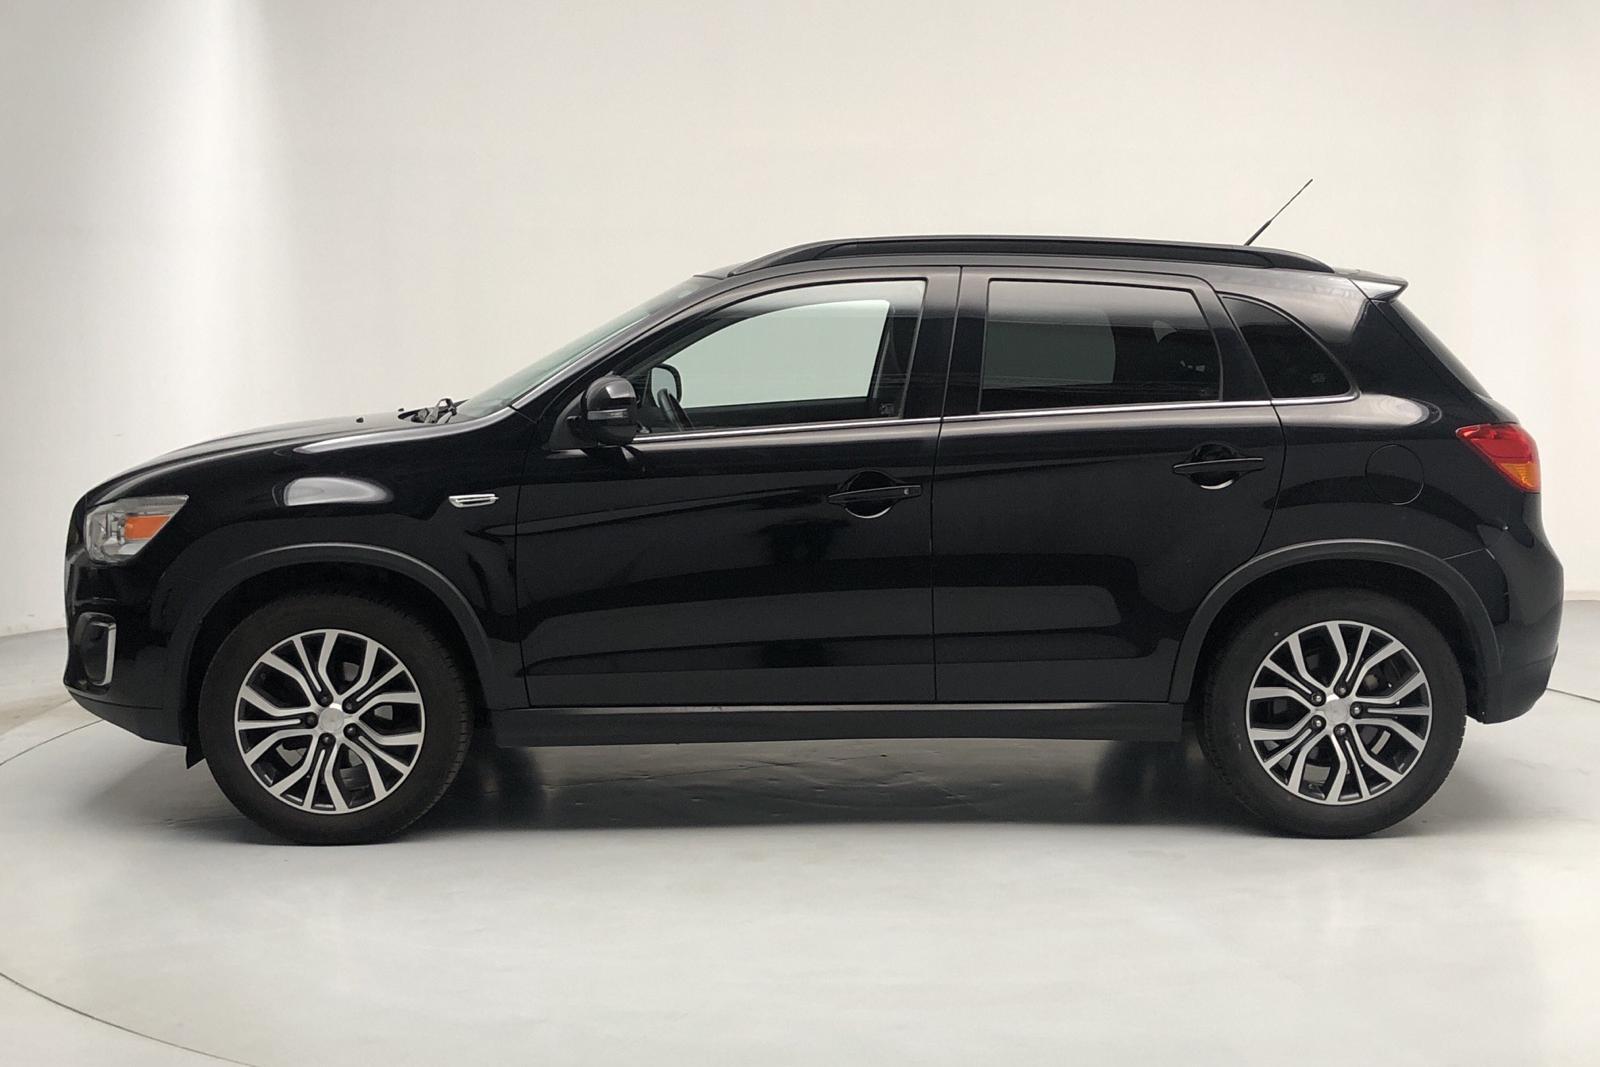 Mitsubishi ASX 1.6D 4WD (114hk) - 77 000 km - Manual - black - 2015